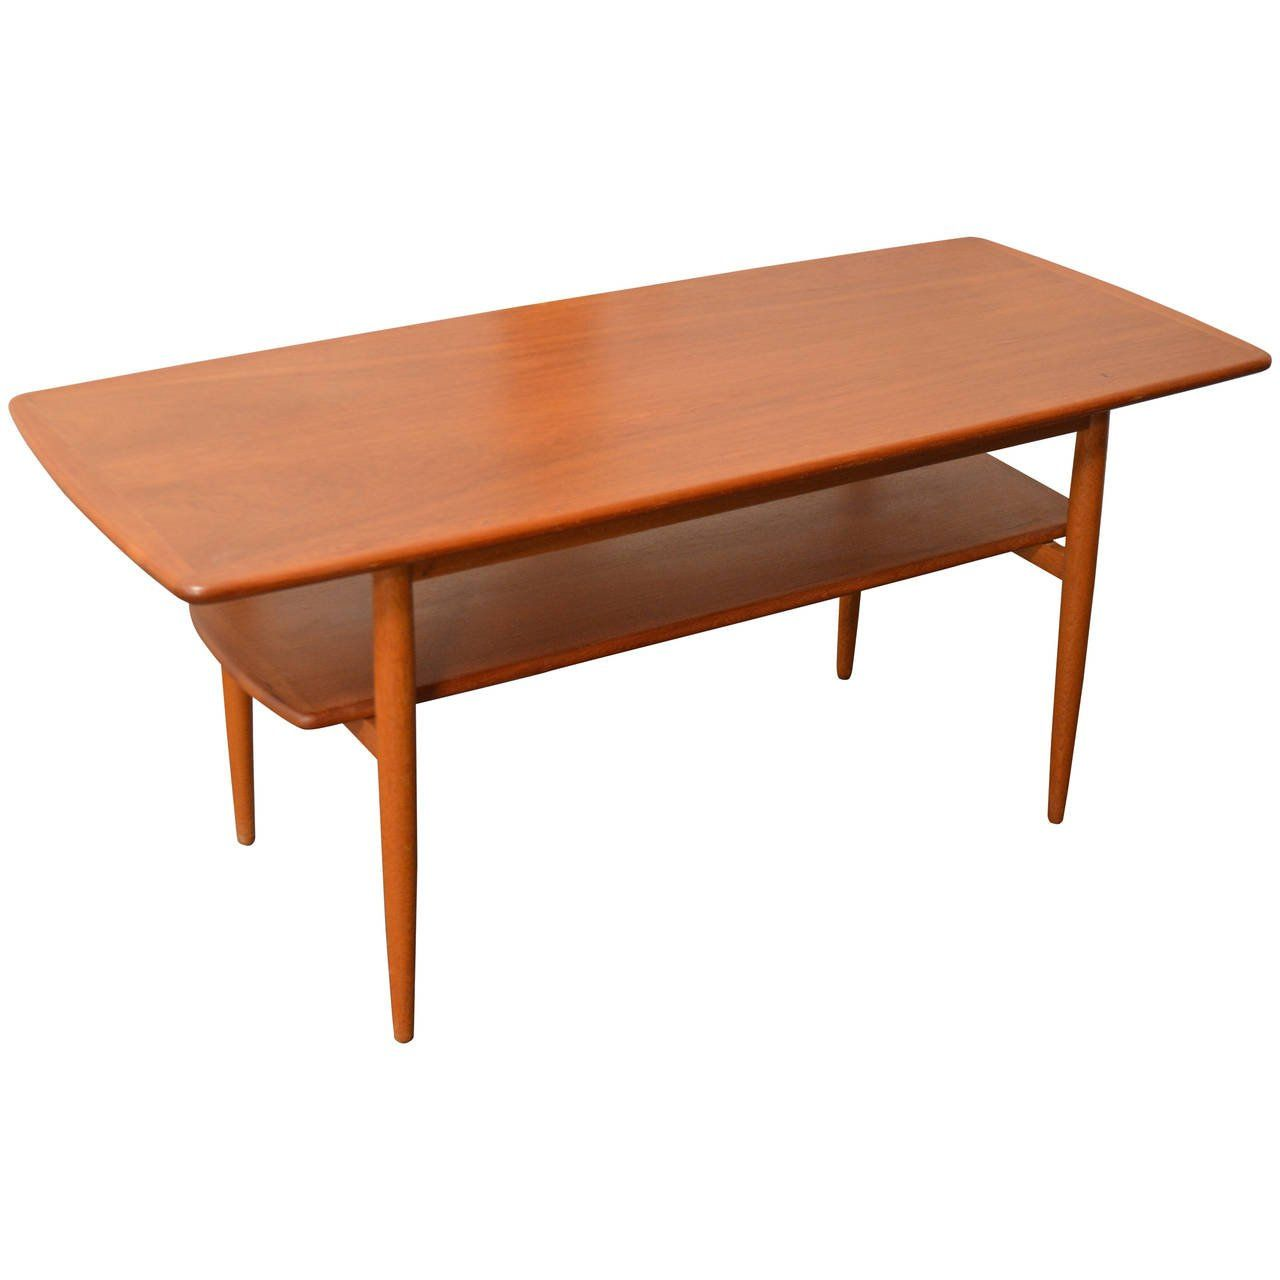 Modern Teak Coffee Table - Living Room Furniture Sets Cheap Check ...